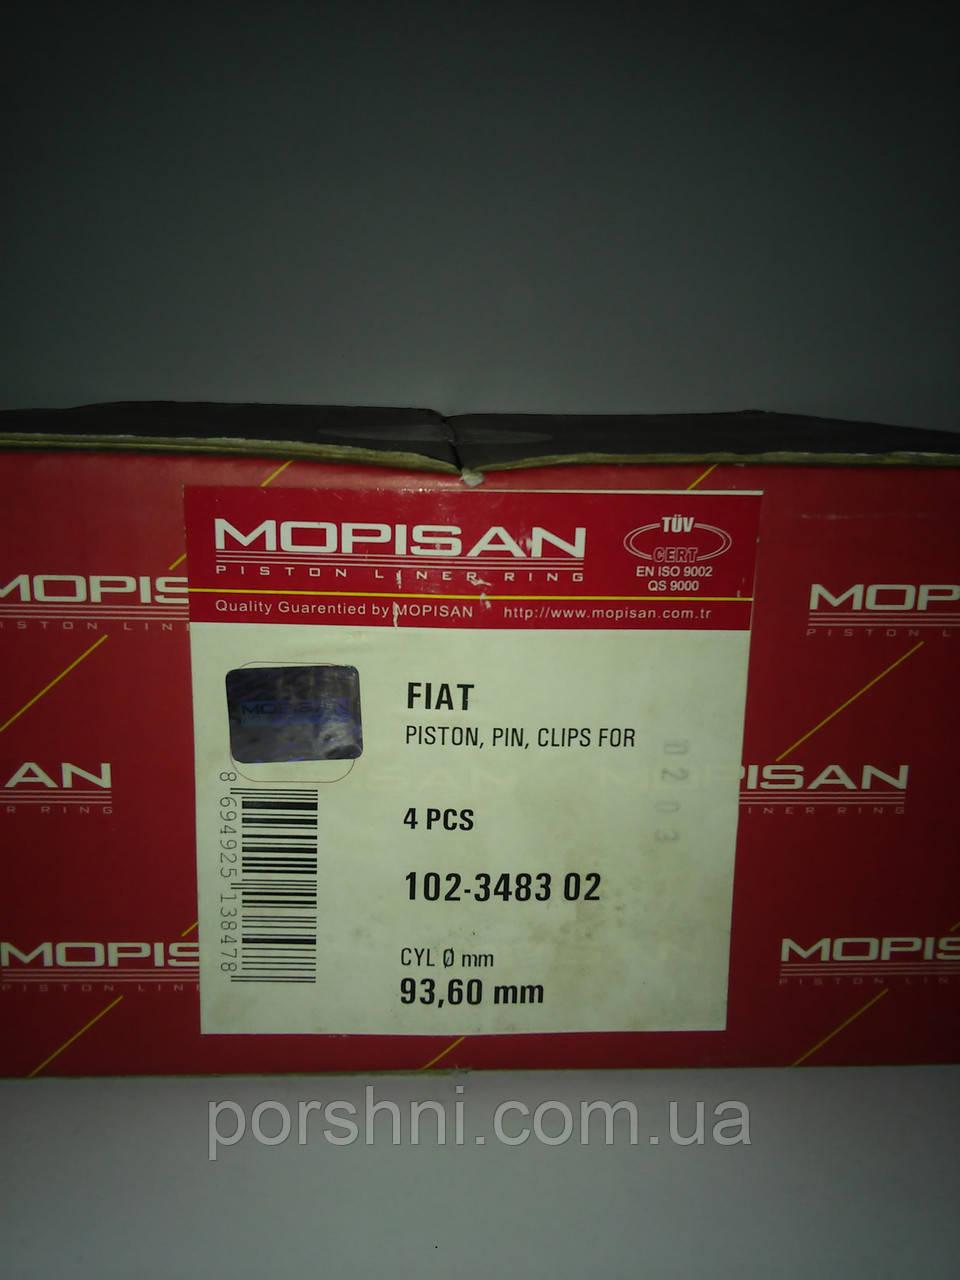 Поршни  Фиат  2.5 д.  ( 3 х 2 х 3 )   диам  93.4 Mopisan 348301